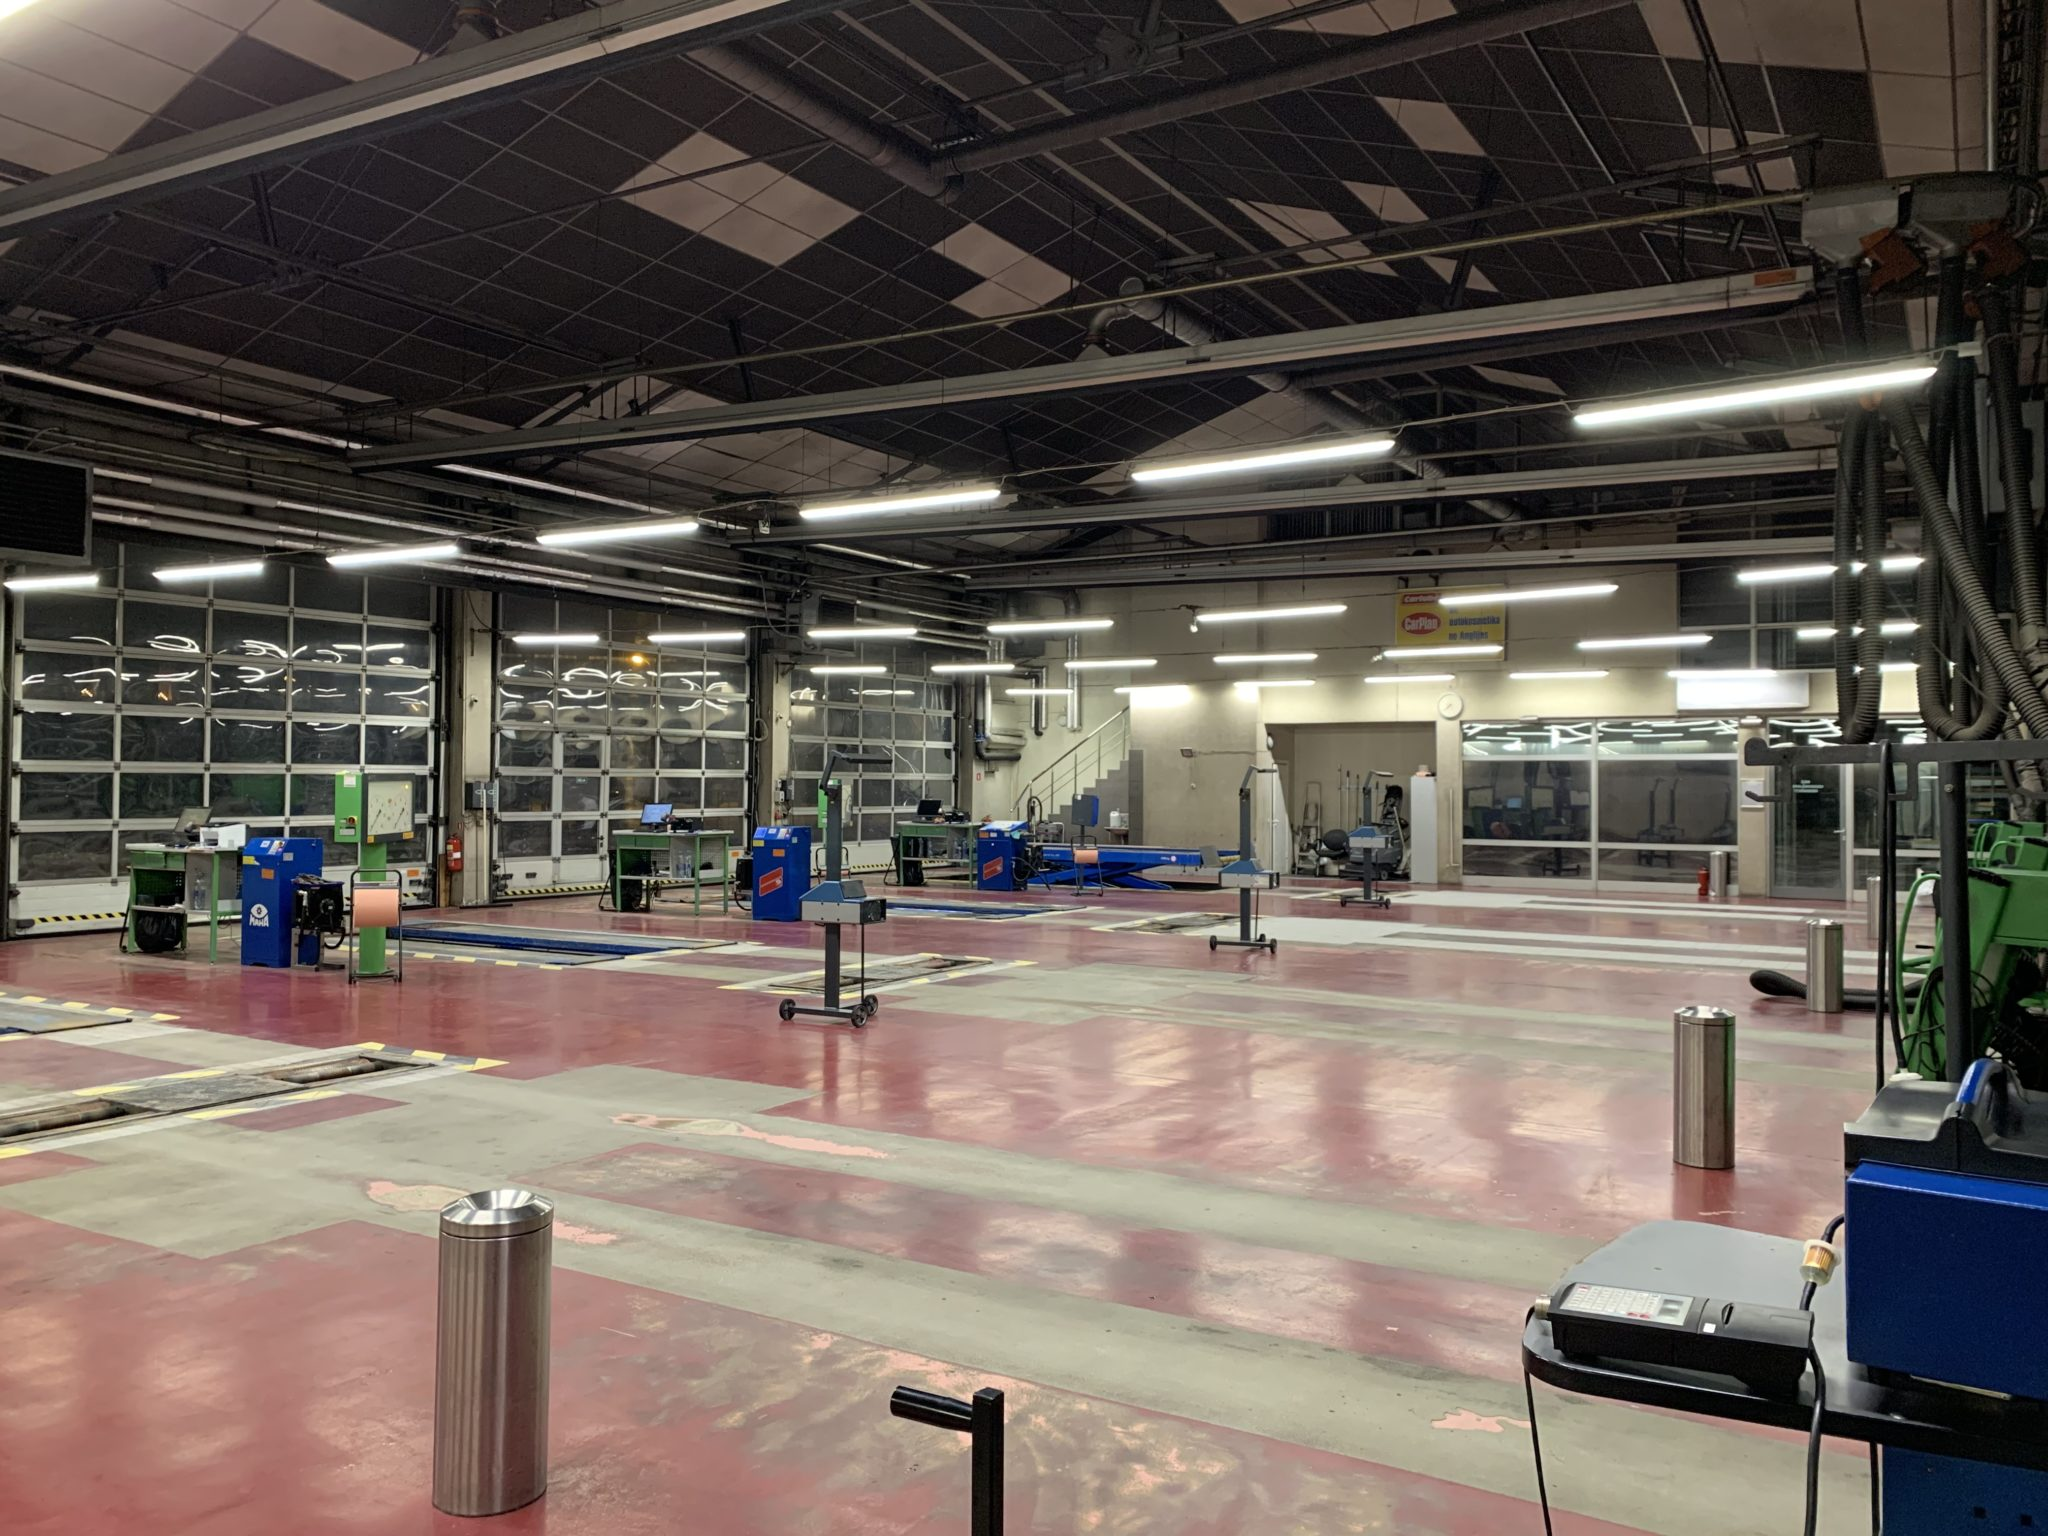 Lines of Philips Led luminaires iluminating techincal inspection station